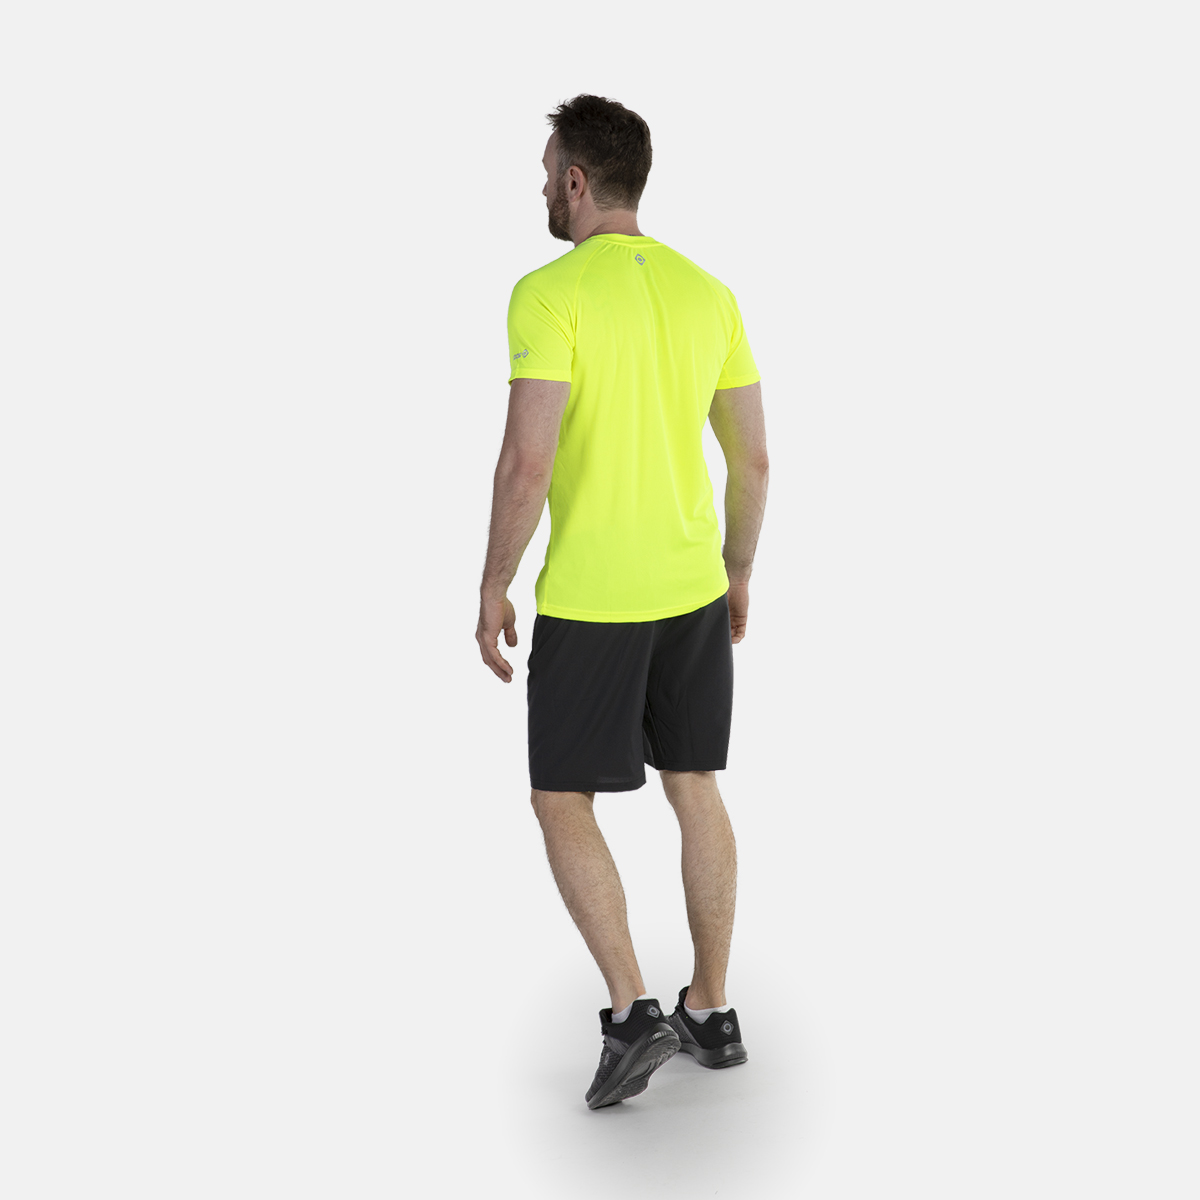 MAN'S DUFOUR RUNNING SHORT BLACK